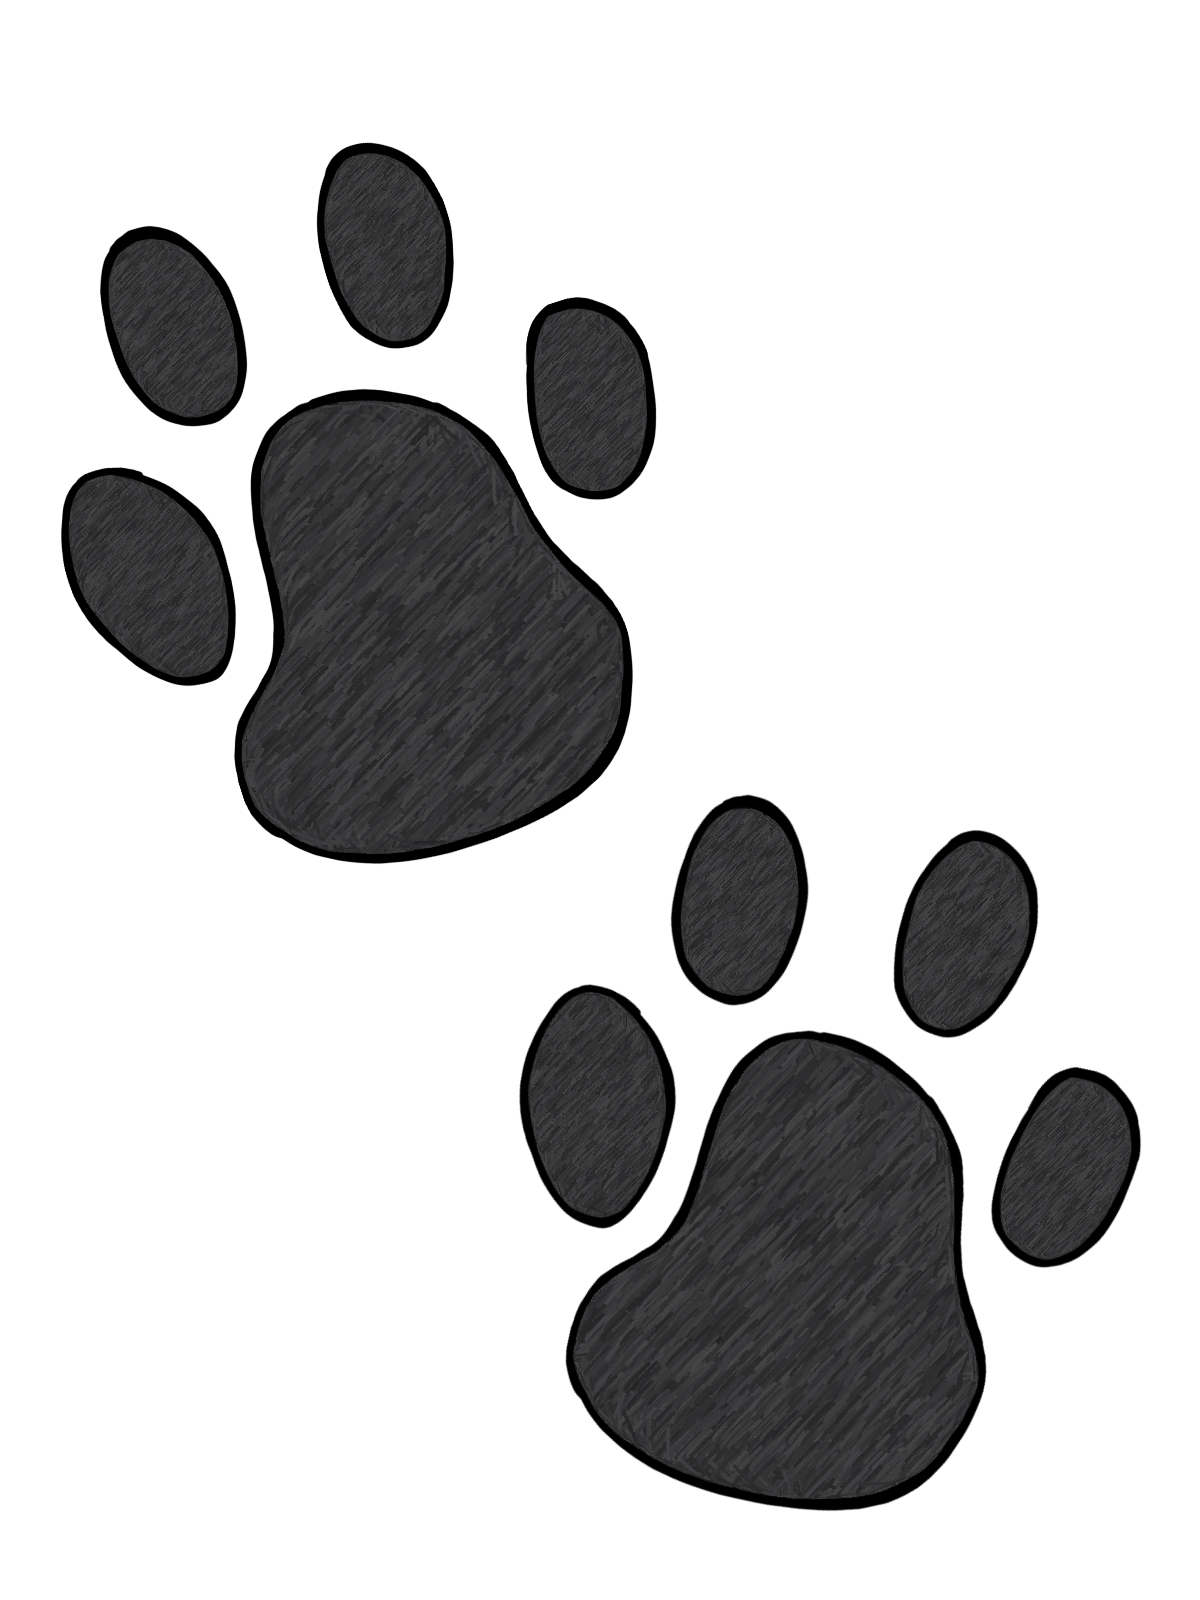 1200x1600 Paw Prints Dog Paw Print Stamps Dog Prints Clip Art 2